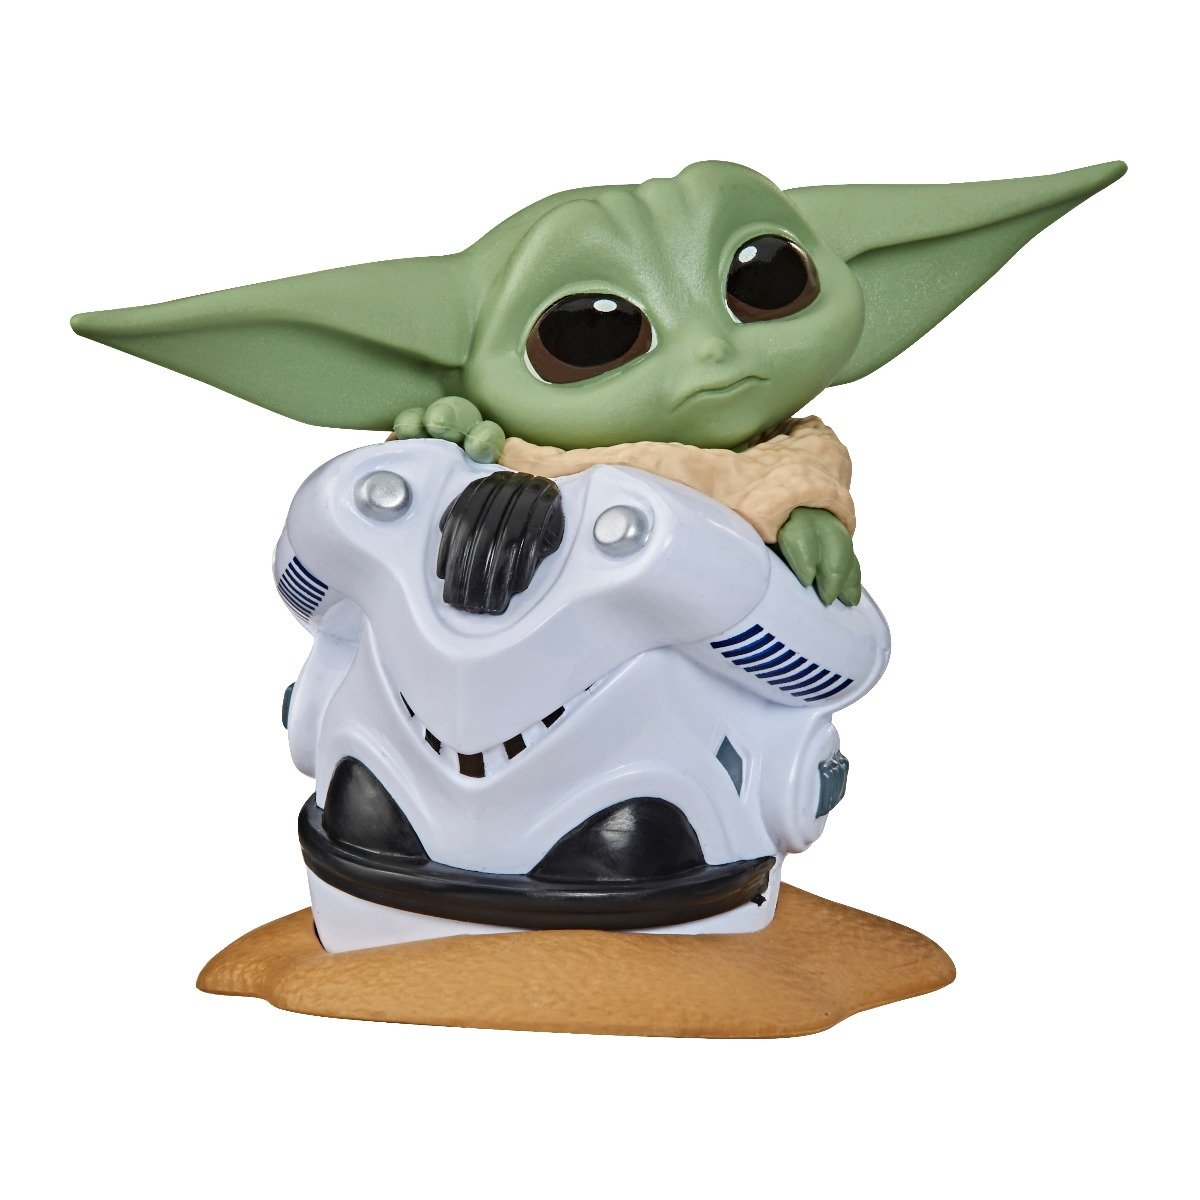 Figurina Star Wars Baby Yoda, Helmet Hide, F19745L00, 6 cm